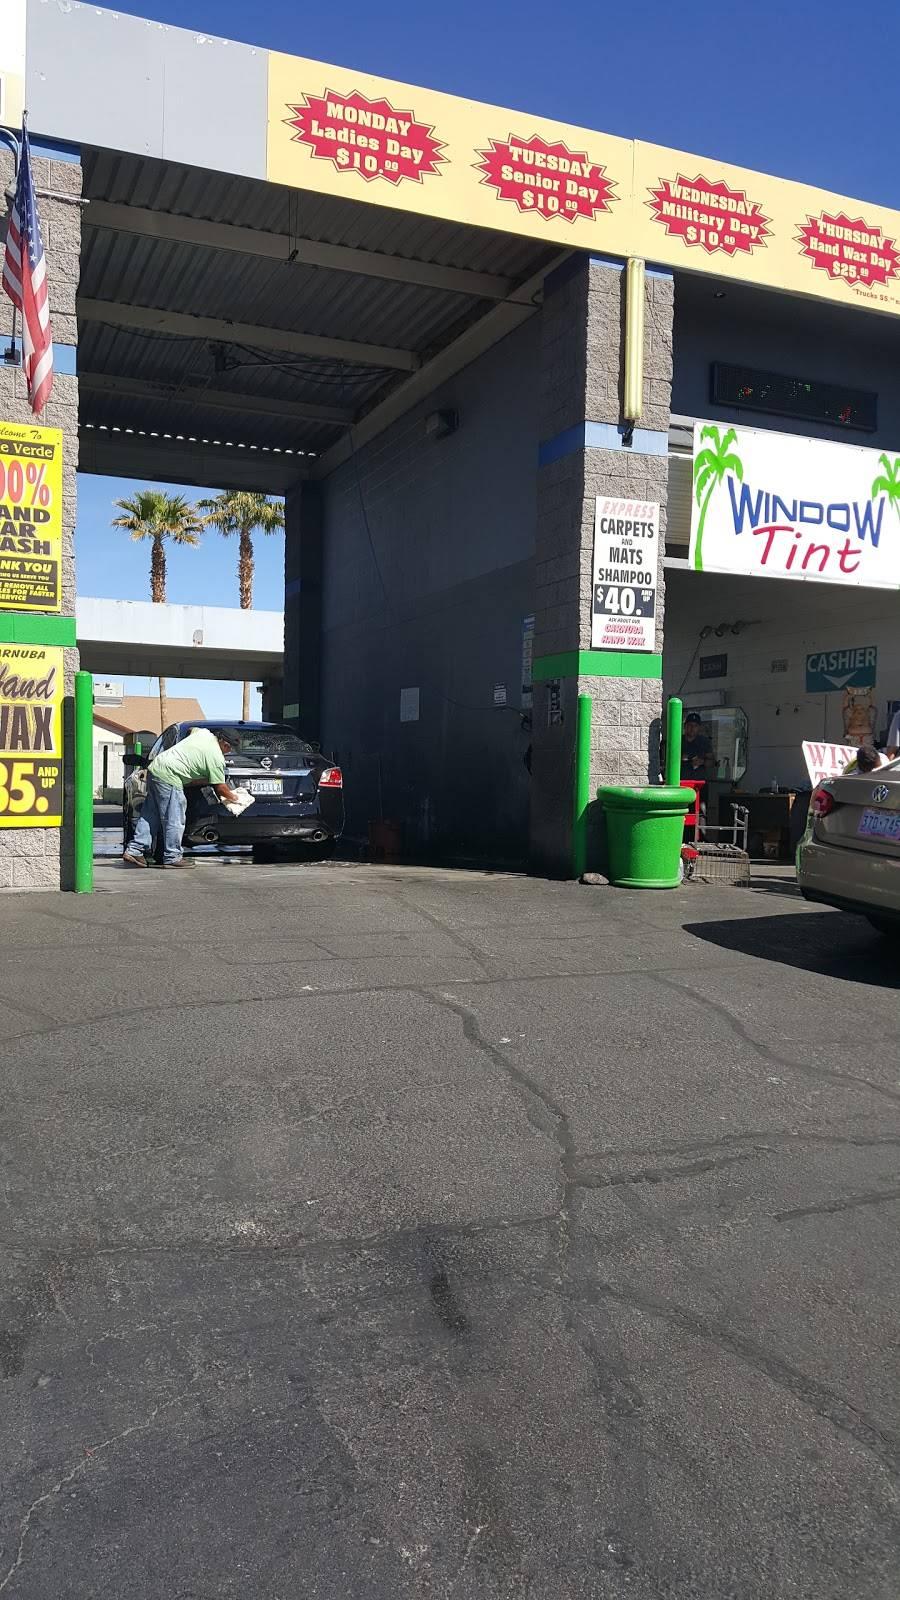 Nates Smog N Go Gas & Diesel - gas station  | Photo 6 of 9 | Address: 5782 E Charleston Blvd, Las Vegas, NV 89142, USA | Phone: (702) 438-4555